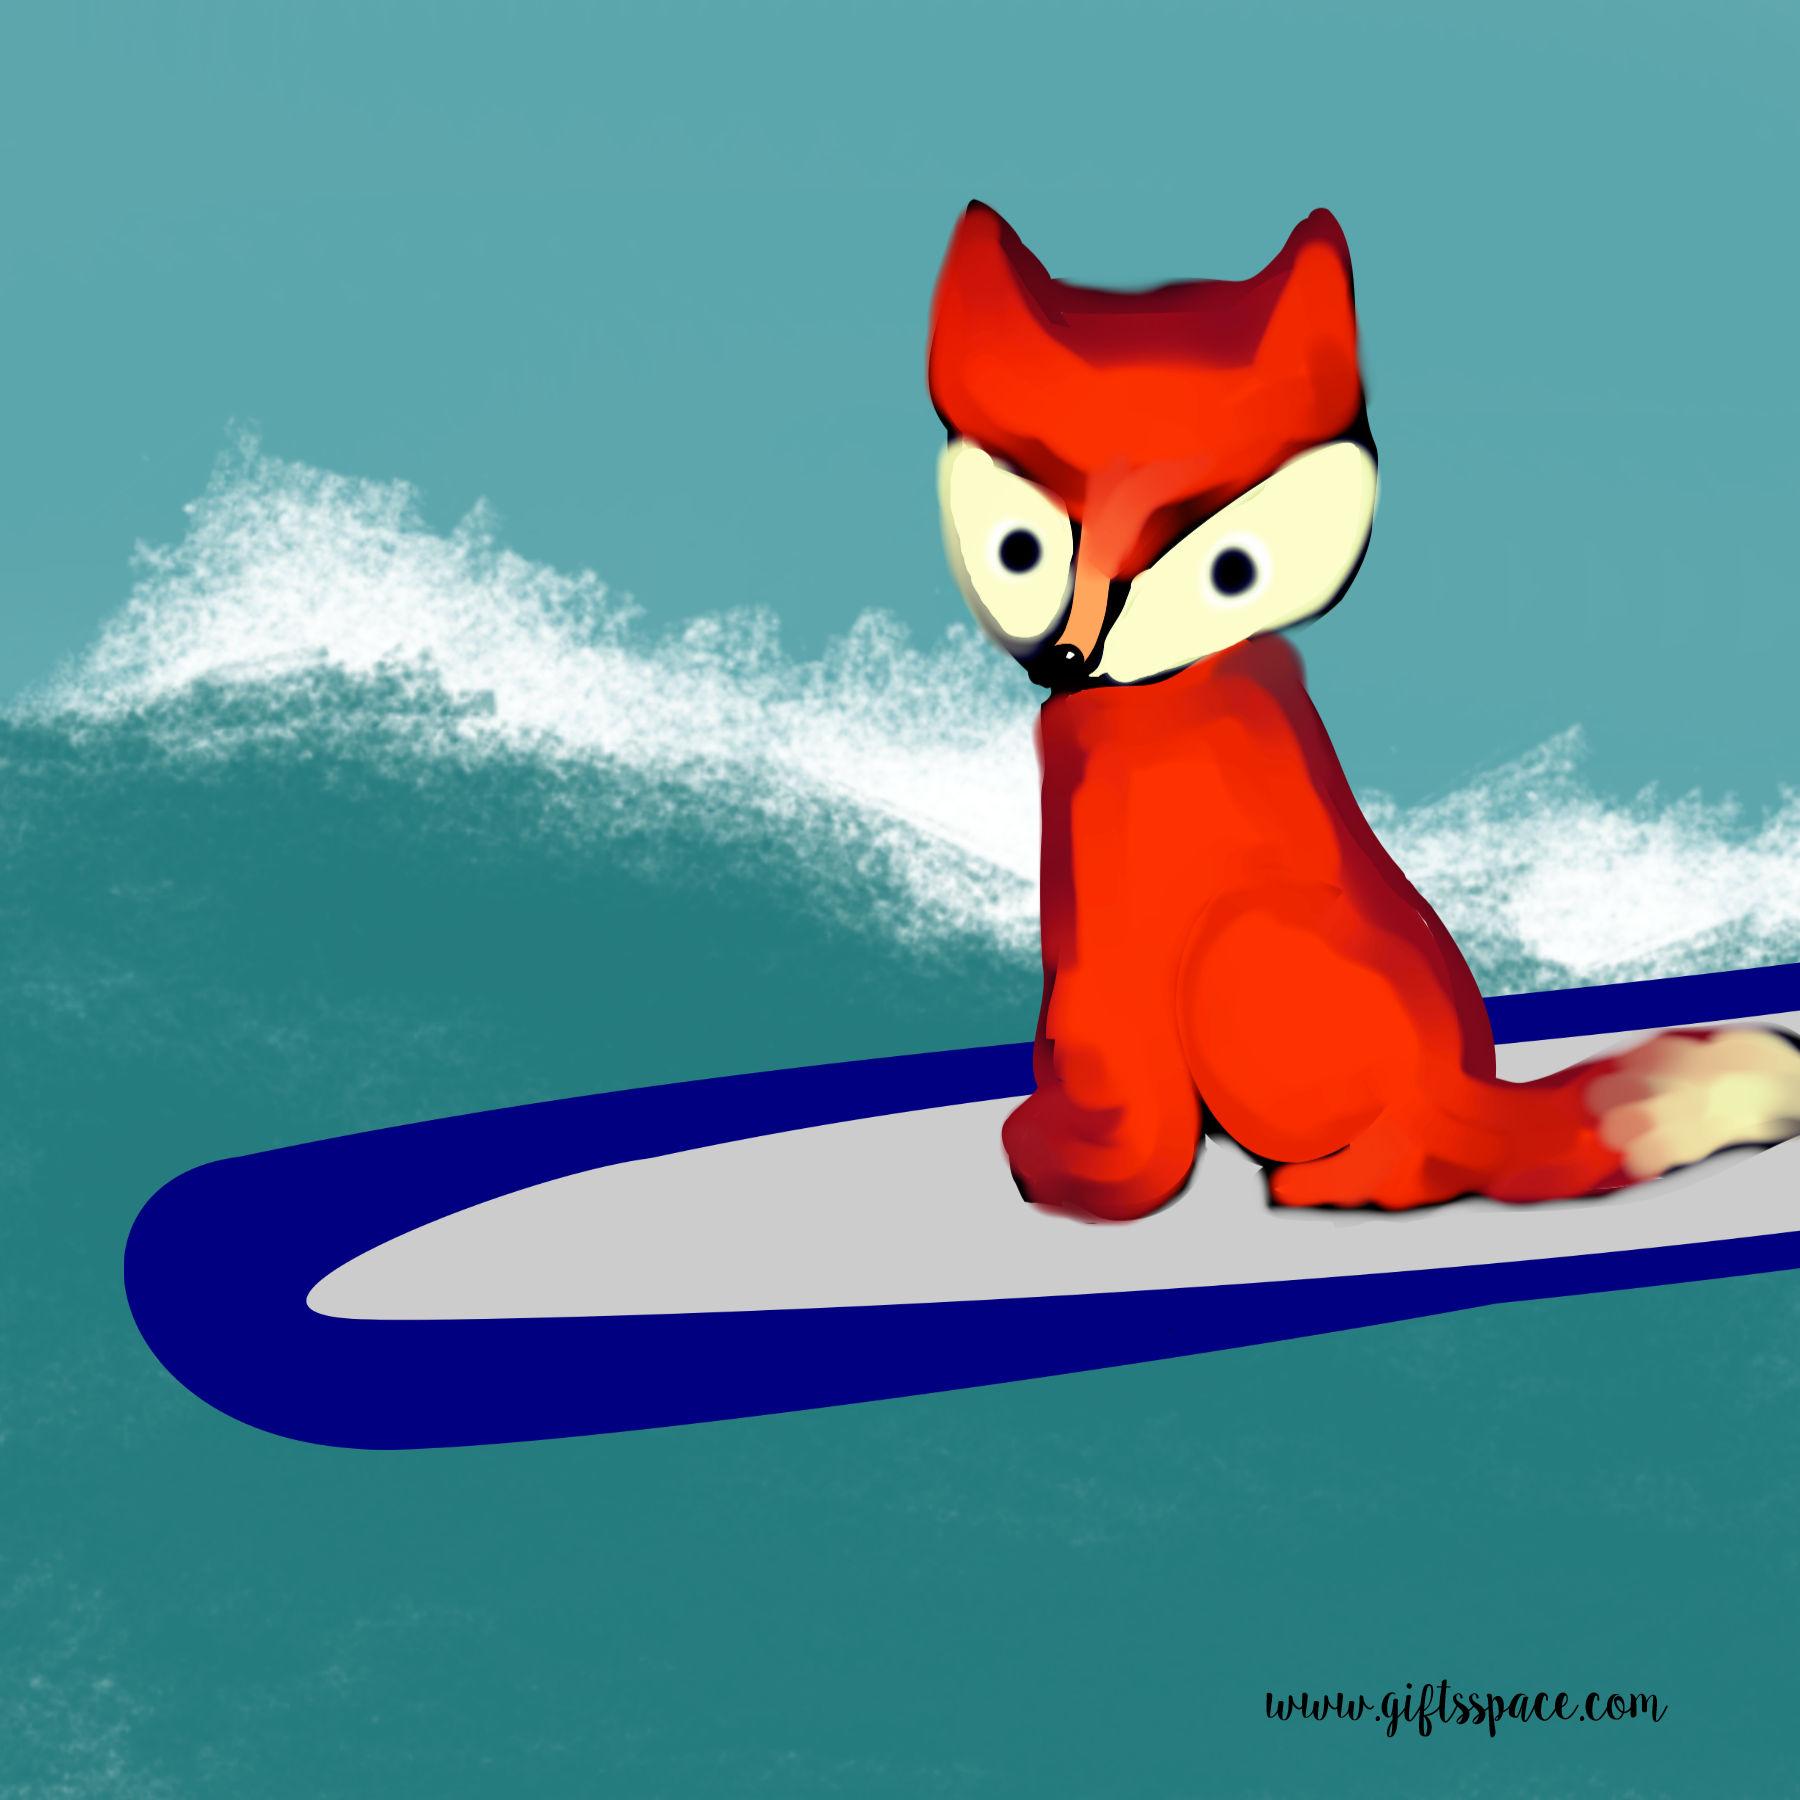 fox on a surfboard